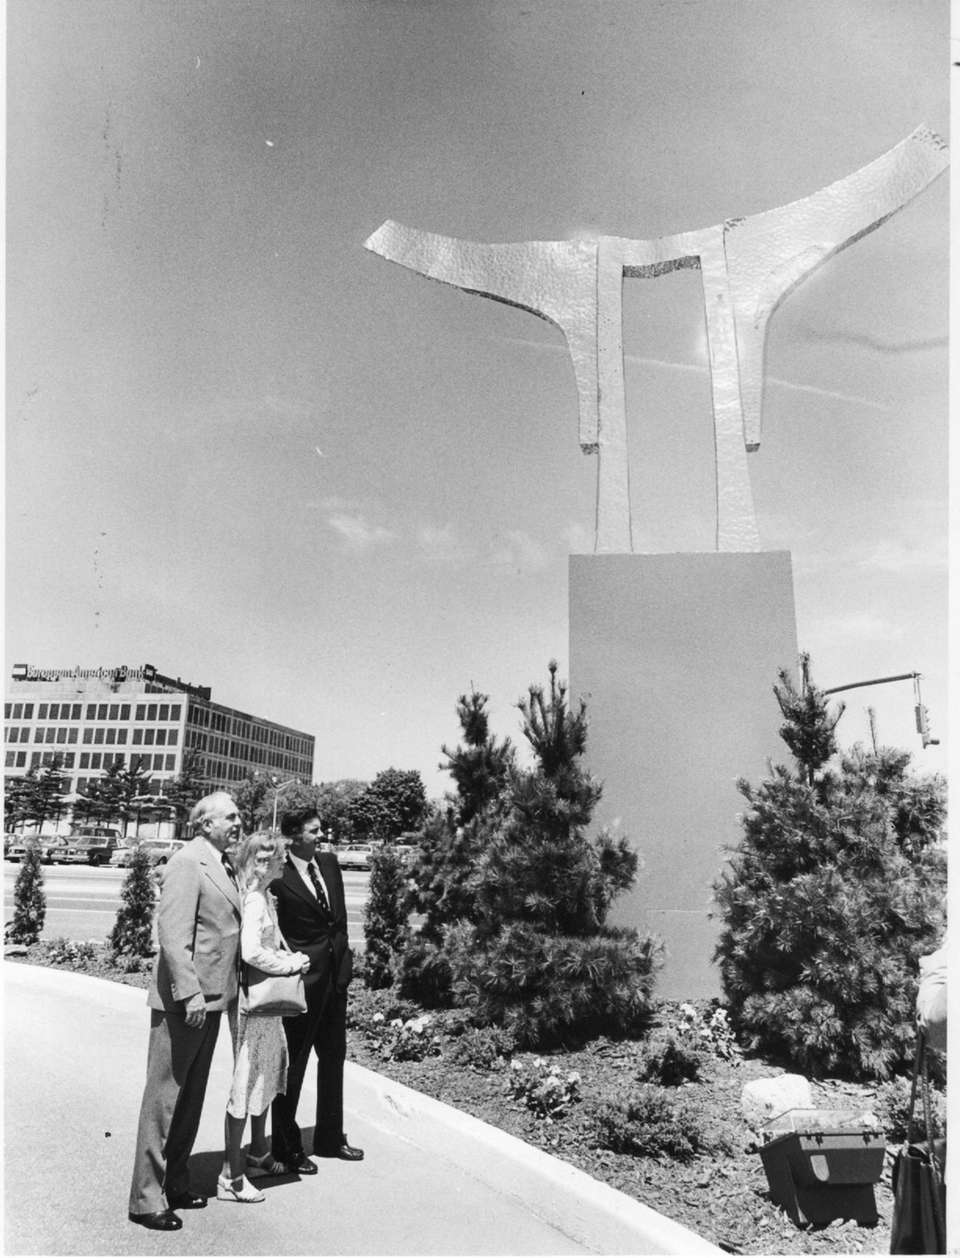 On May 20, 1981, Nassau County Executive Francis